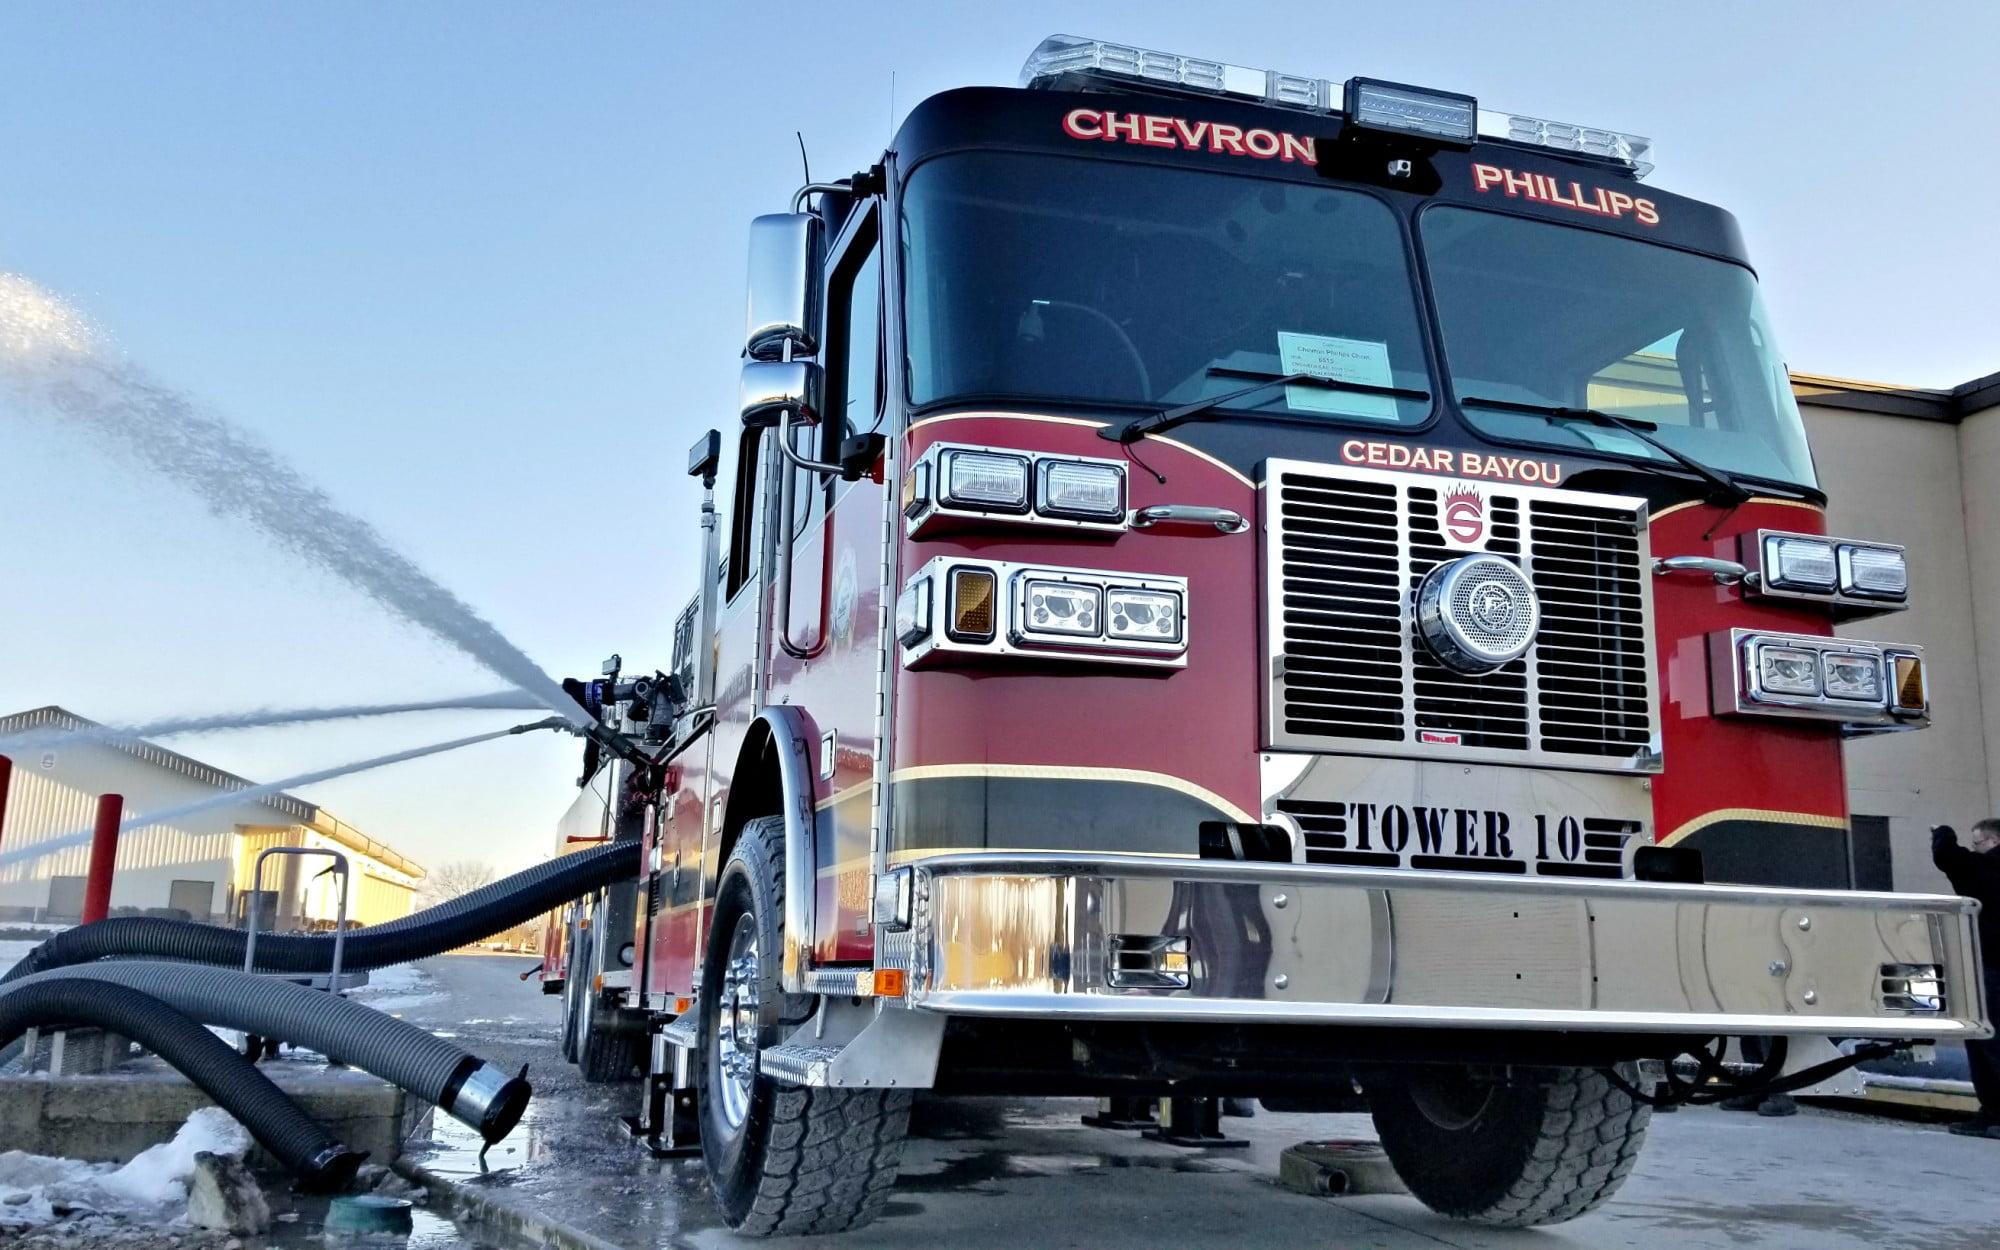 Chevron Phillips Company